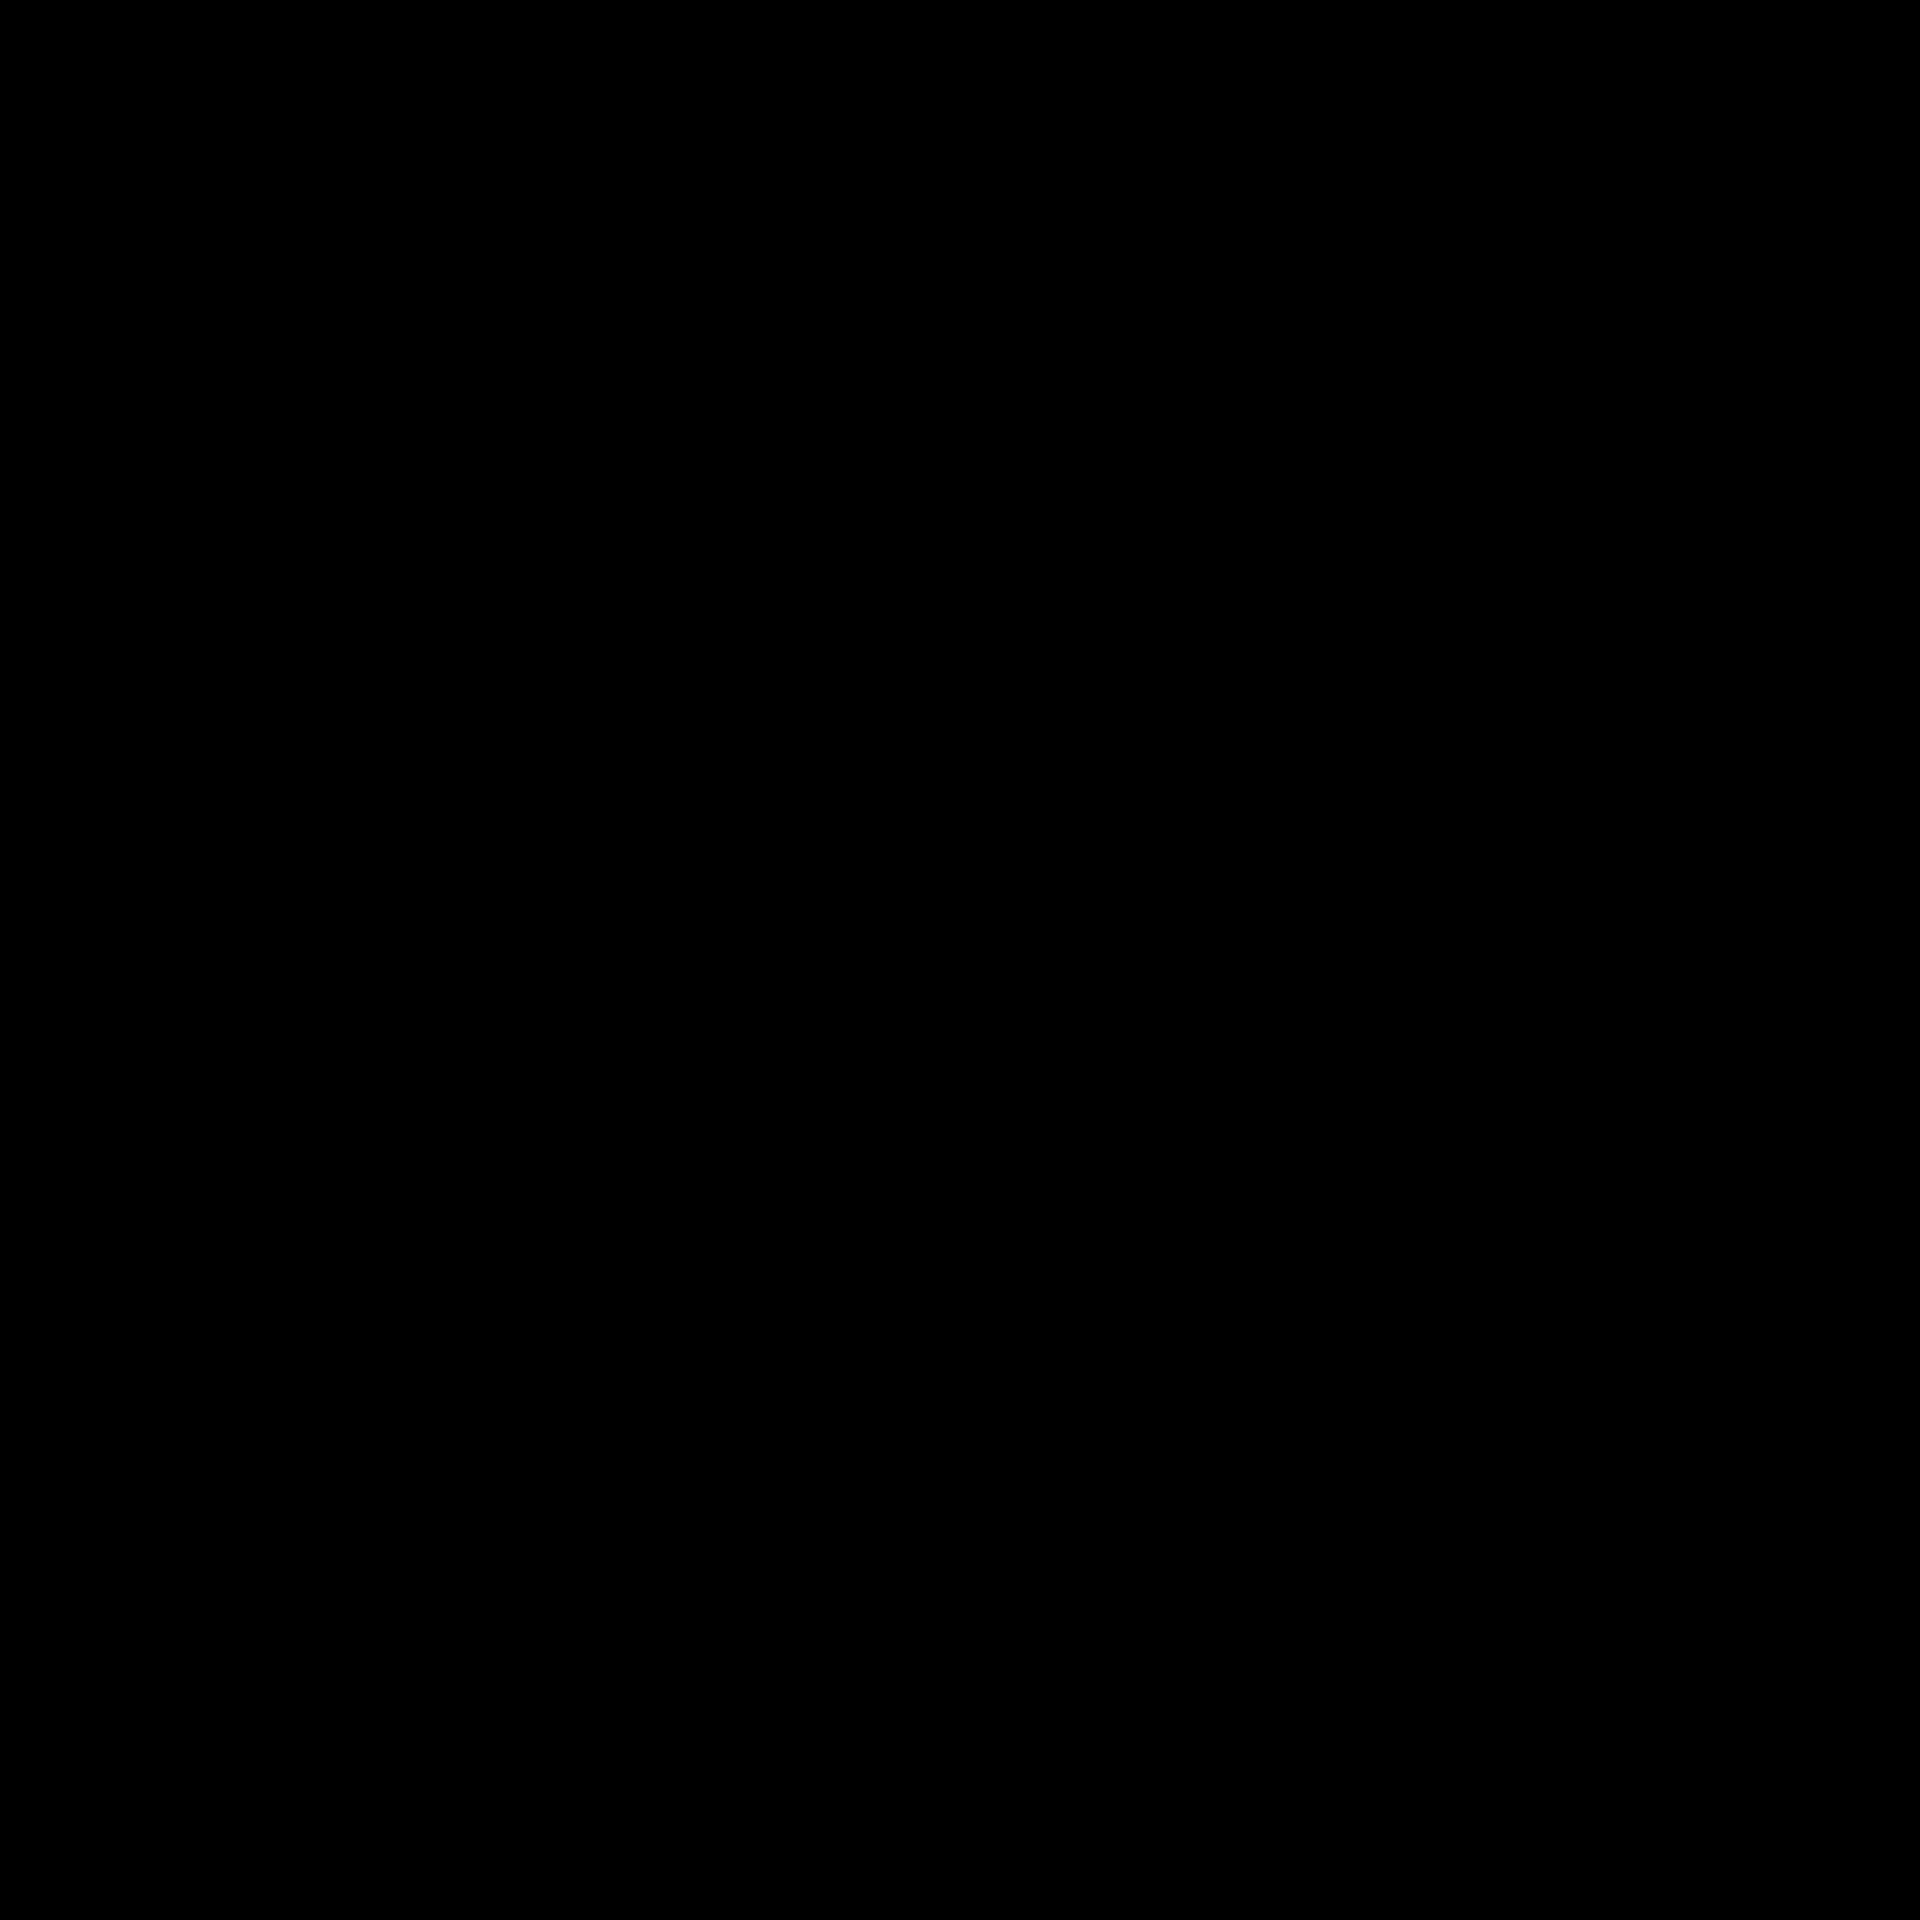 silhouette-2402991_1920